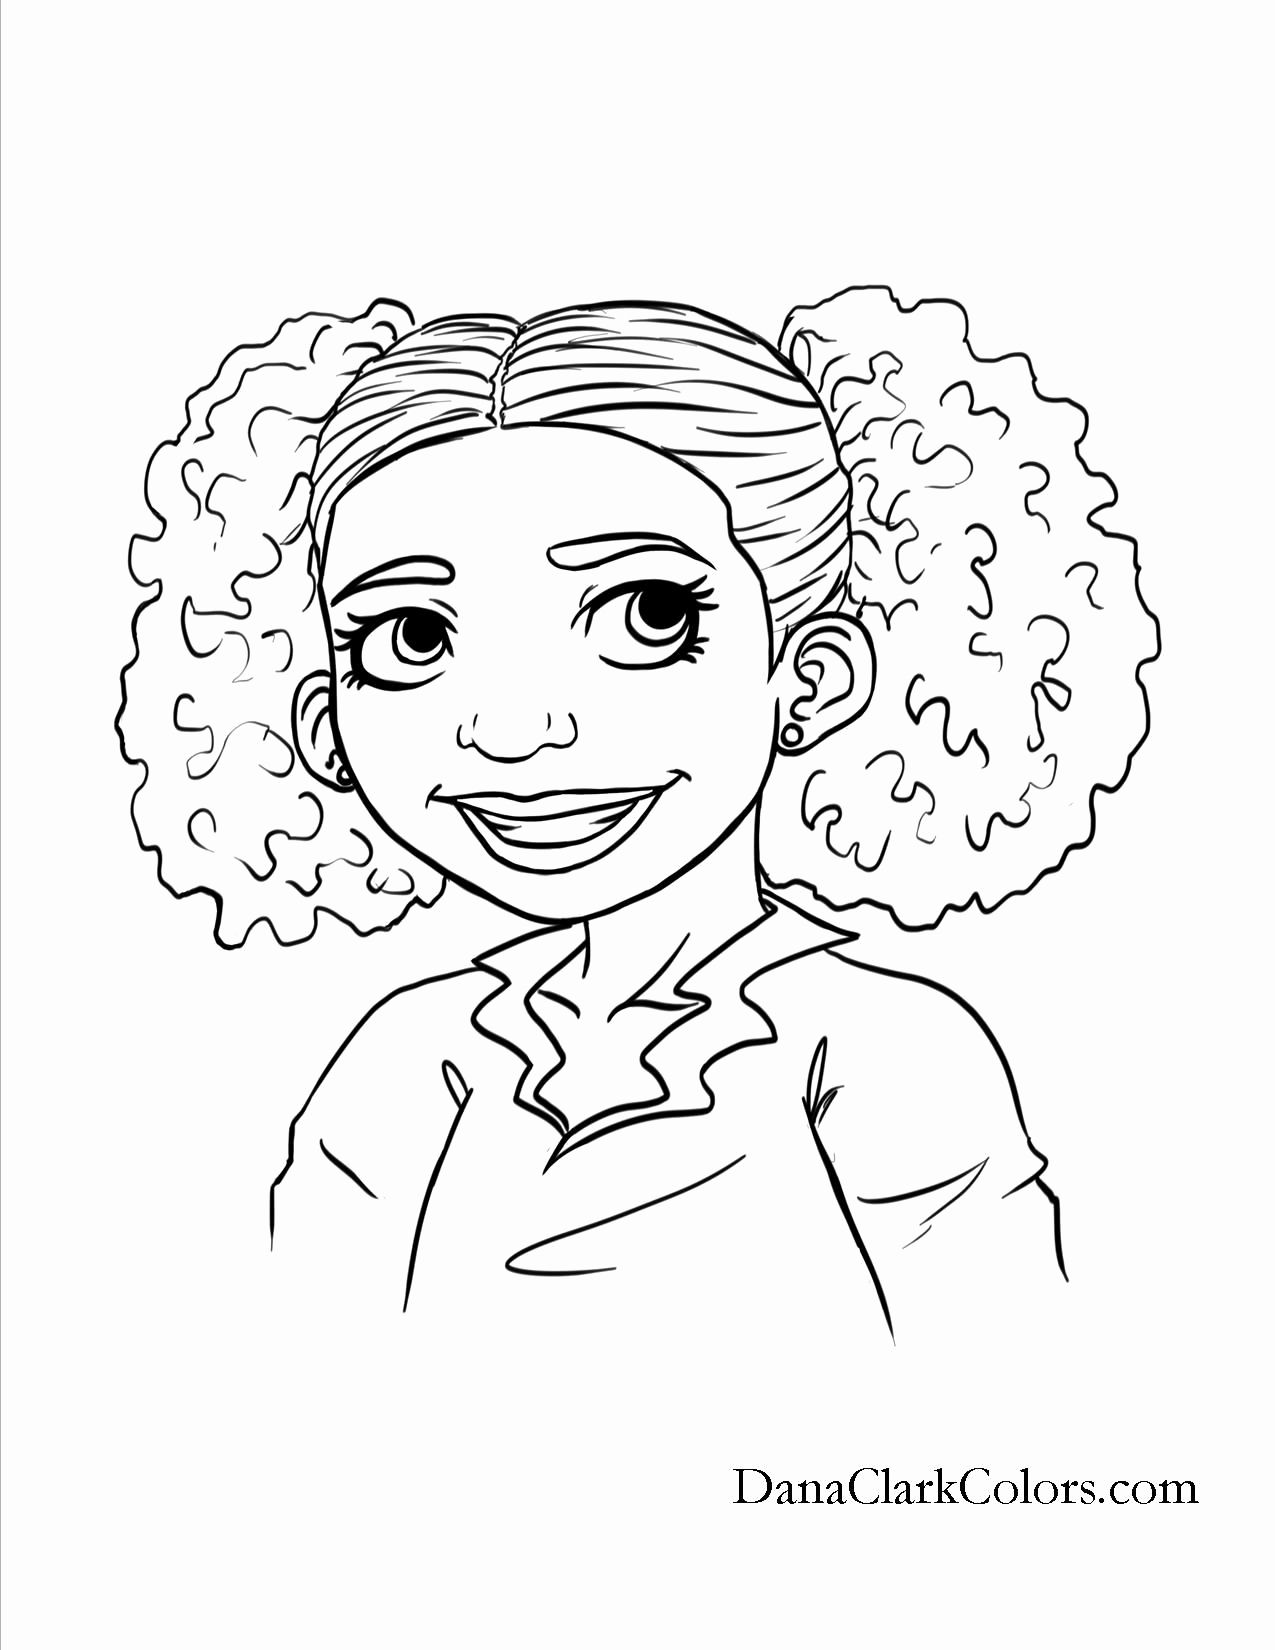 African American Coloring Books Fresh Black Kids Coloring Page Africanamericancoloringpage In 2020 Coloring Books Coloring Pages Coloring Pages For Girls